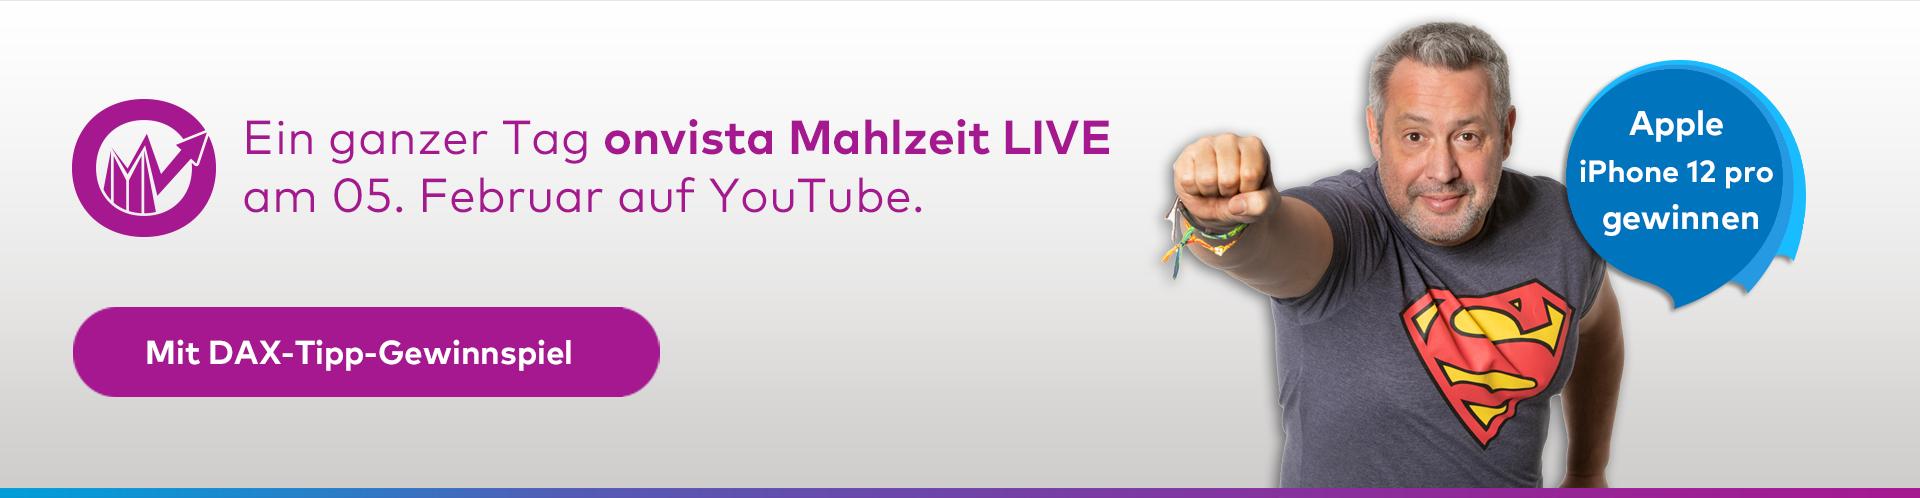 lp_ov_mahlzeit_live_2021-1